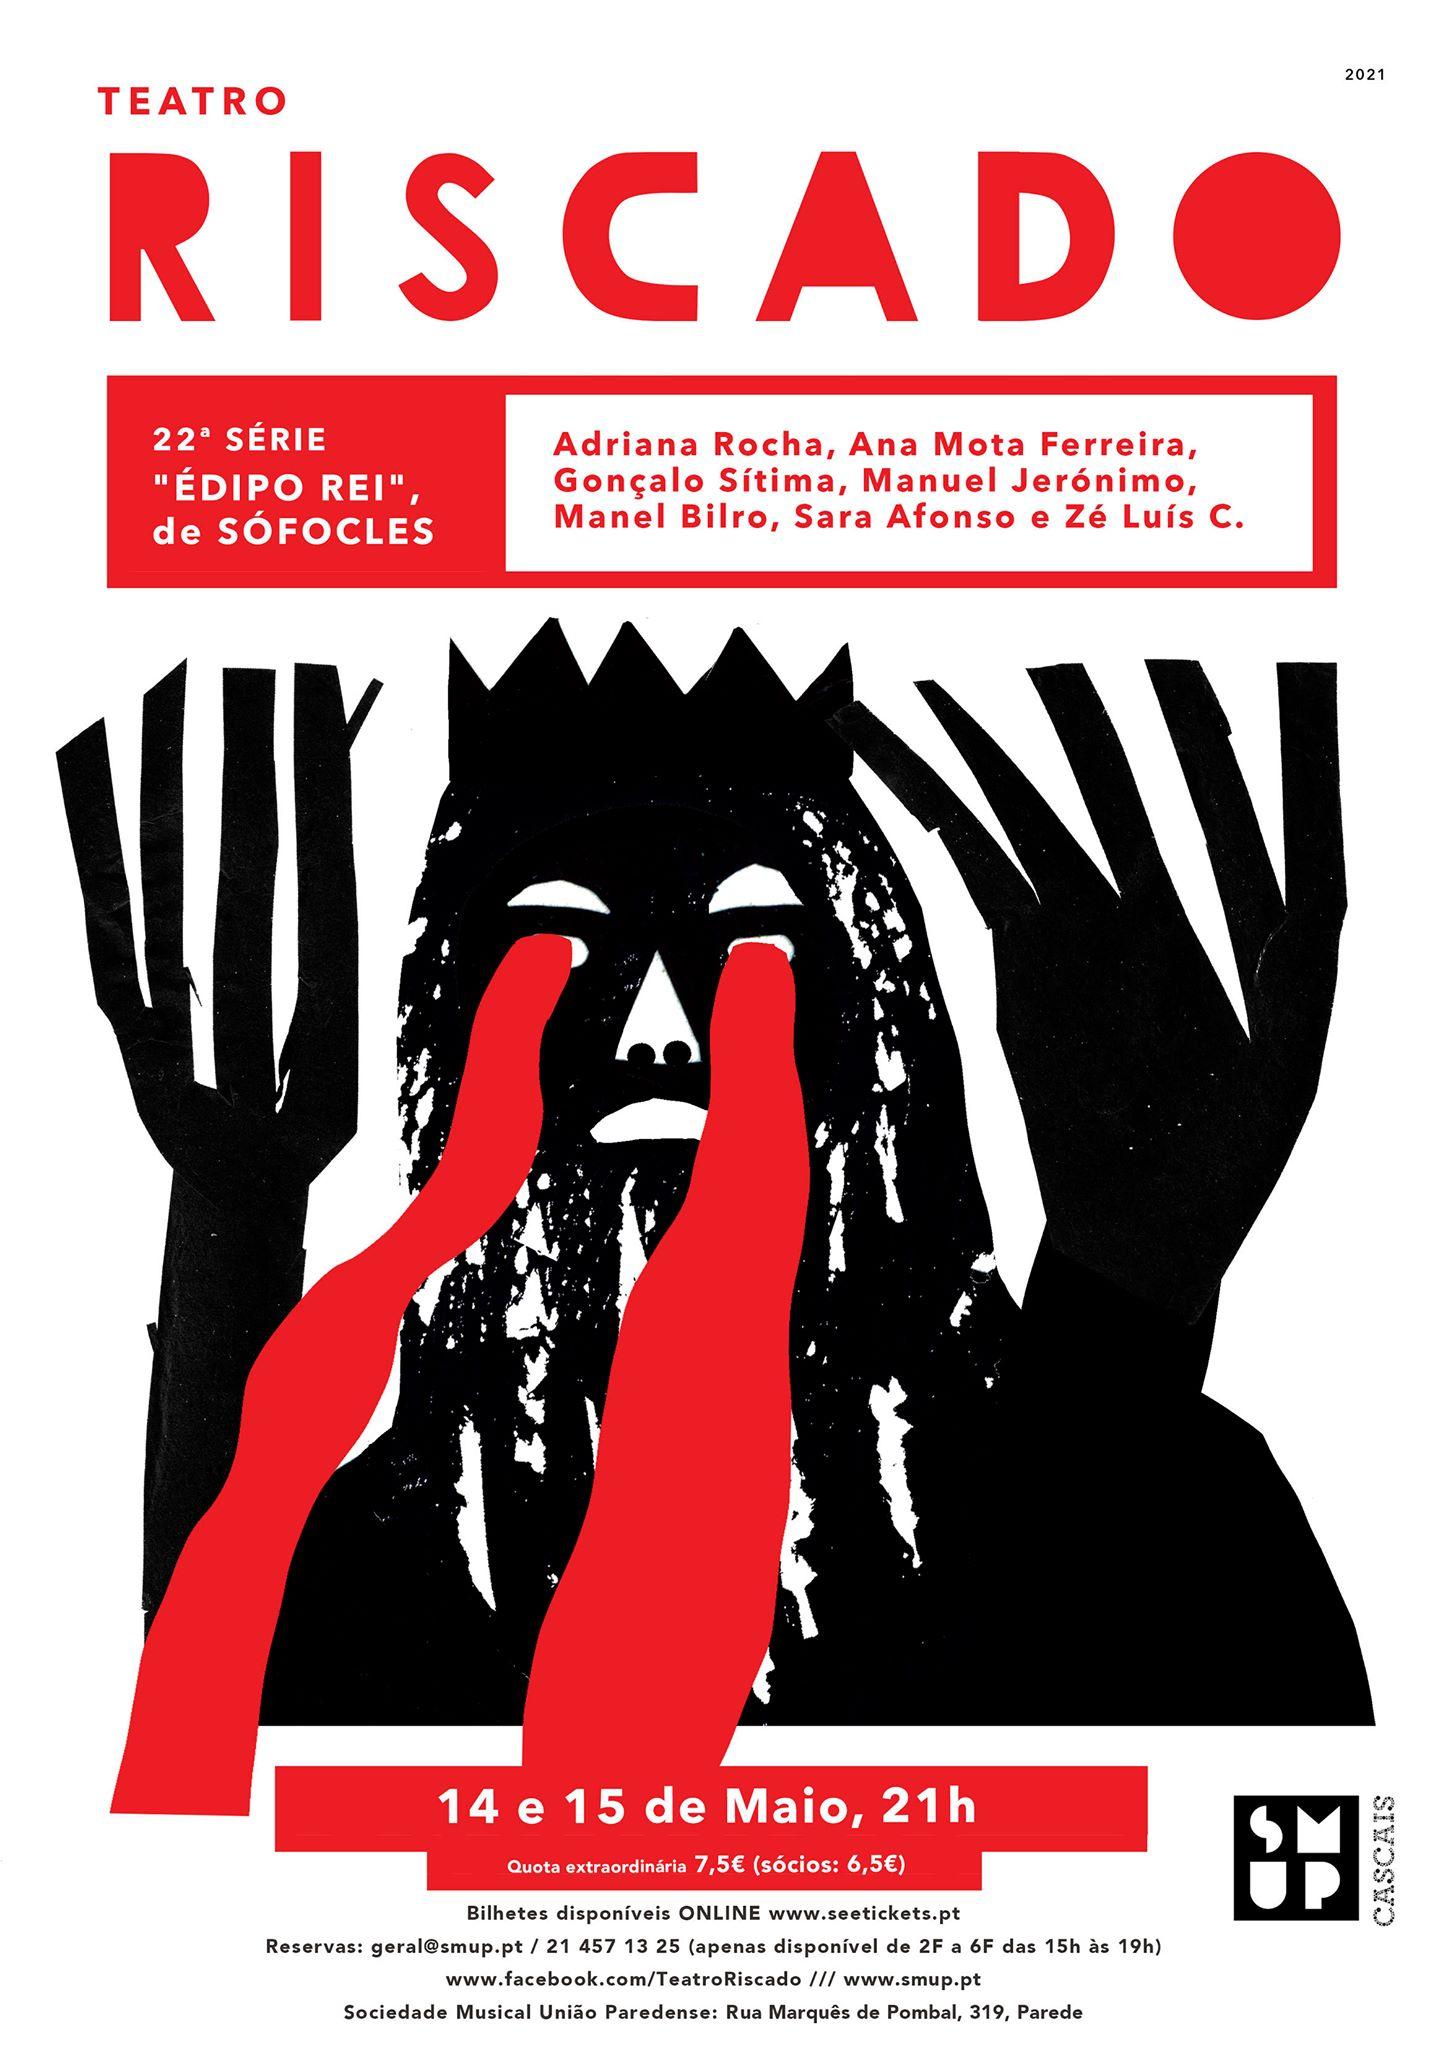 22.ª série Teatro Riscado - 'Édipo Rei', a partir de Sófocles